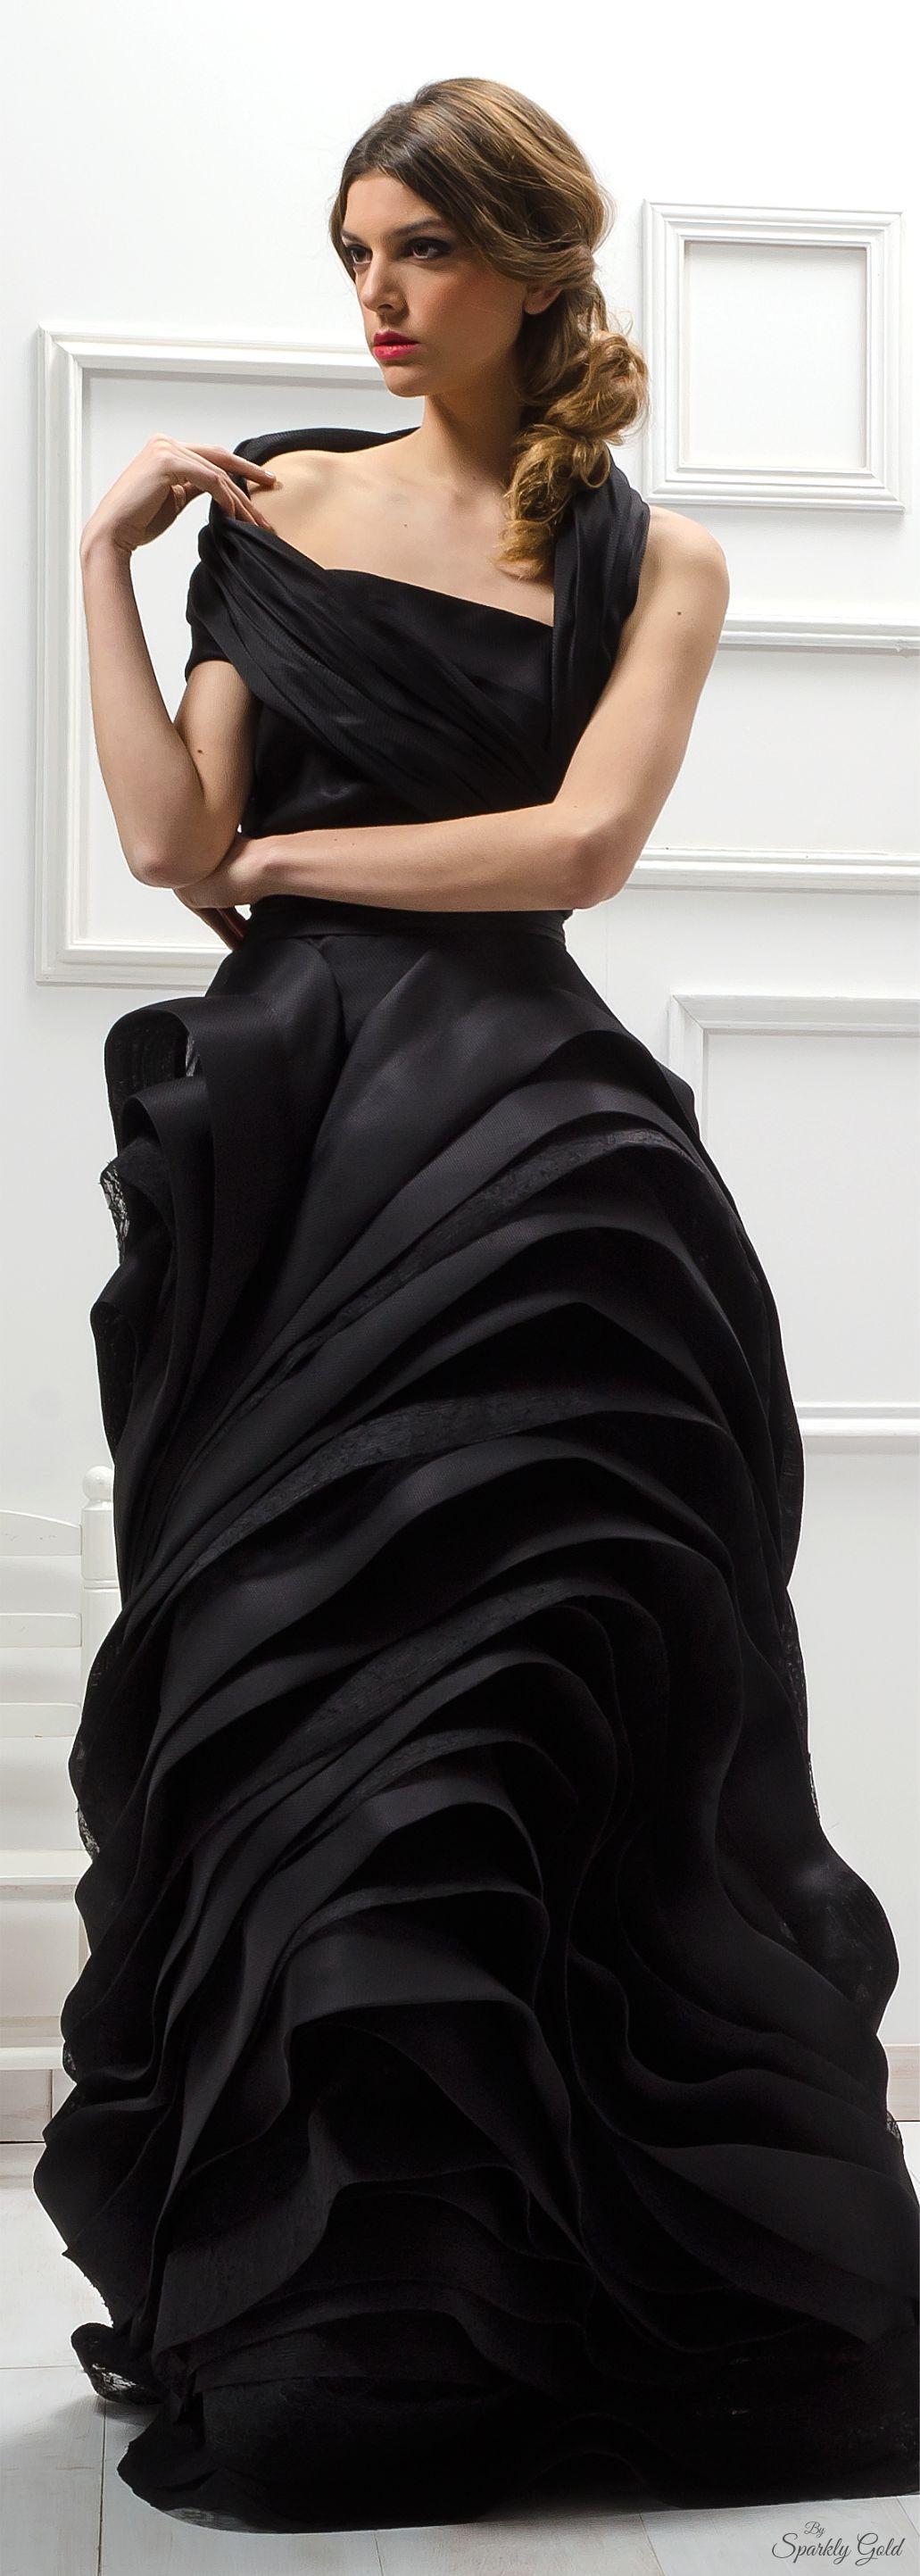 Isabel sanchis dresses pinterest gowns black and fashion black